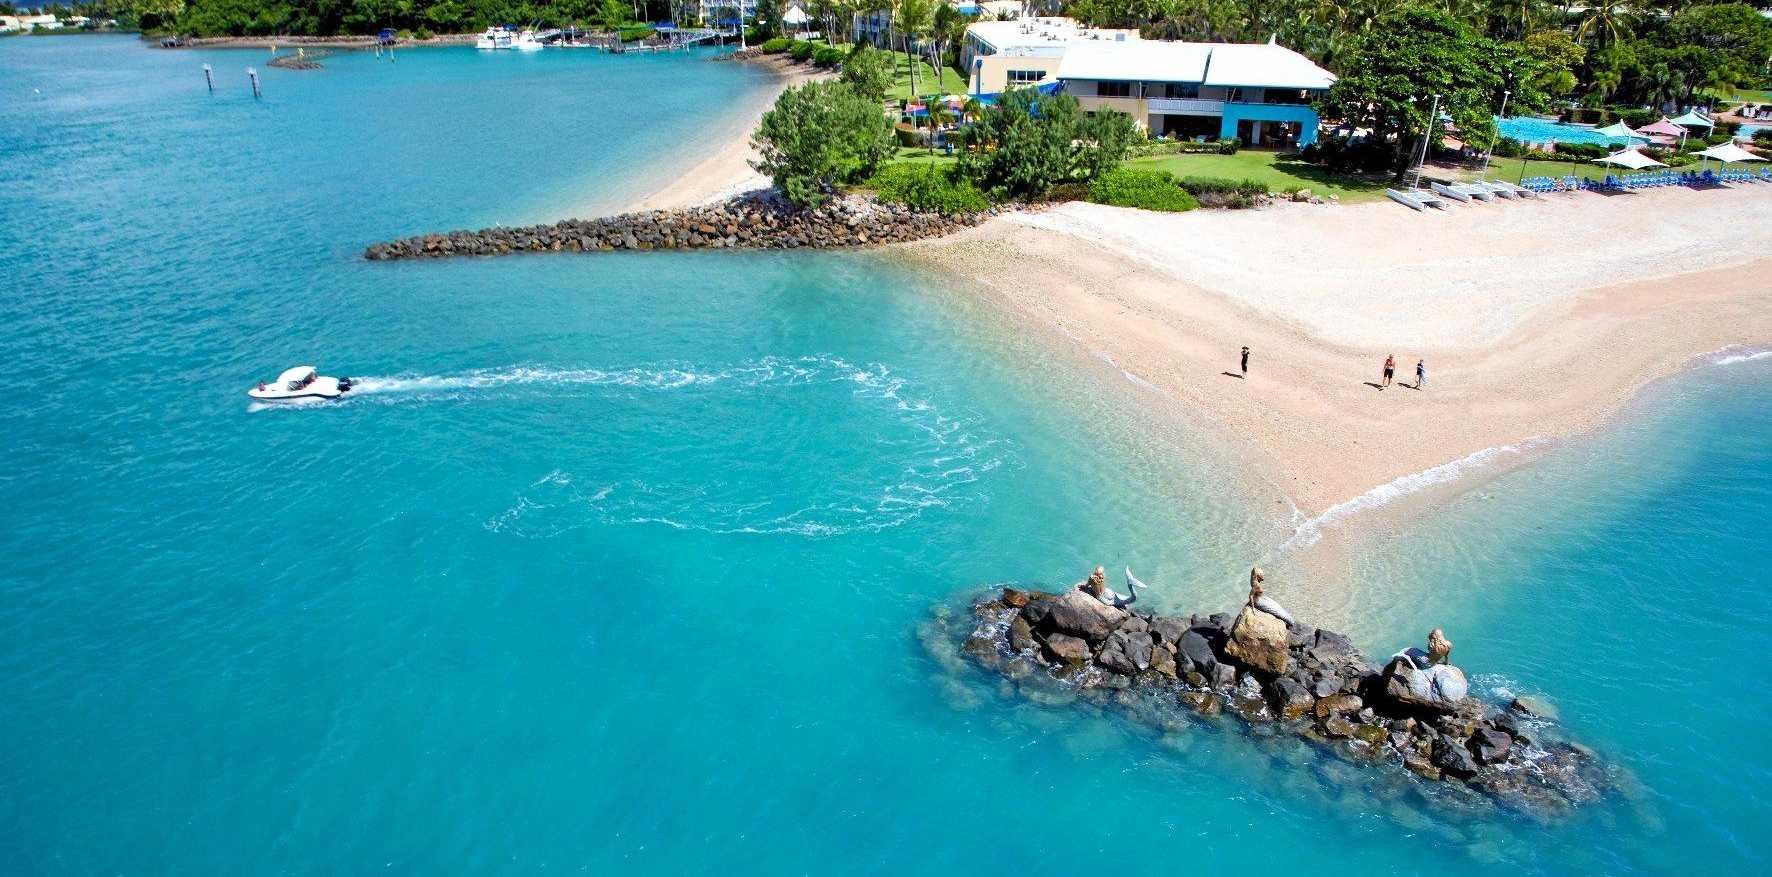 Daydream Island has a $50 million re-development plan in the pipeline.